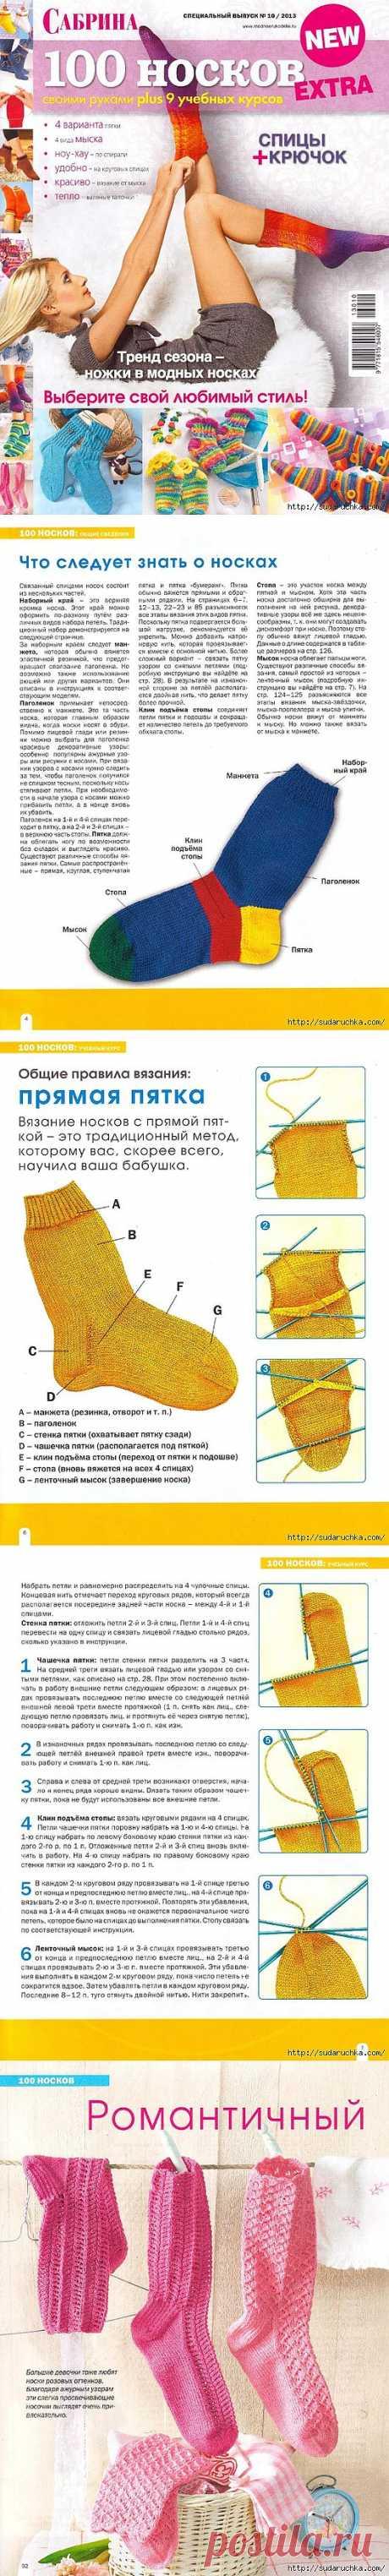 """Сабрина - 100 носков спицами и крючком""="